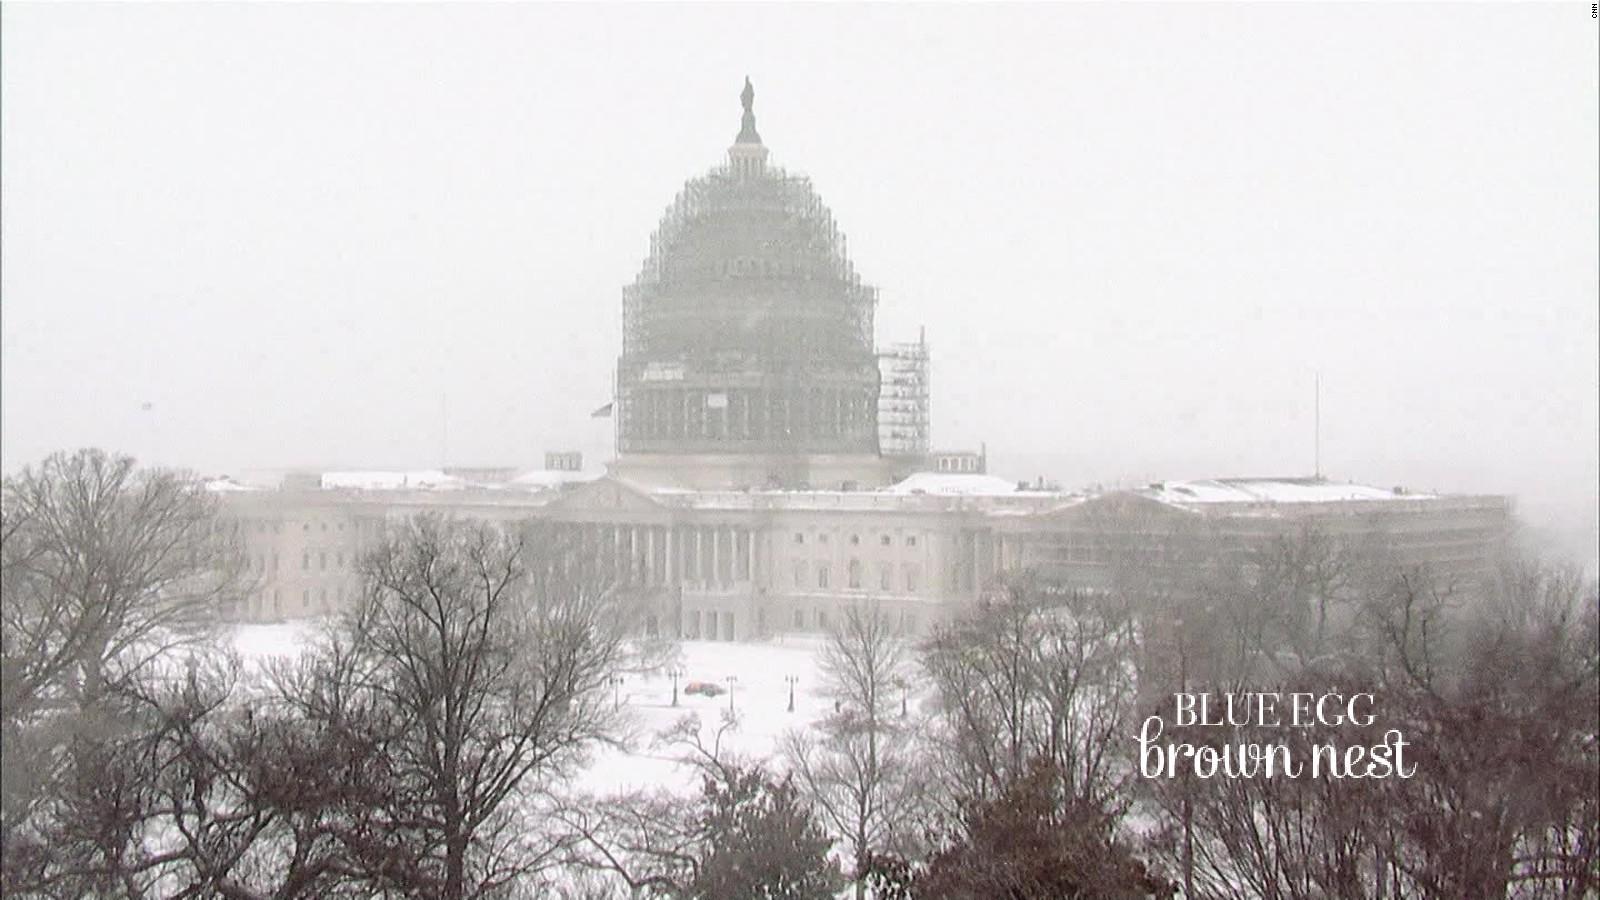 160123180745-blizzard-2016-snowstorm-time-lapse-washington-dc-snow-weather-ar-origwx-00005101-full-169